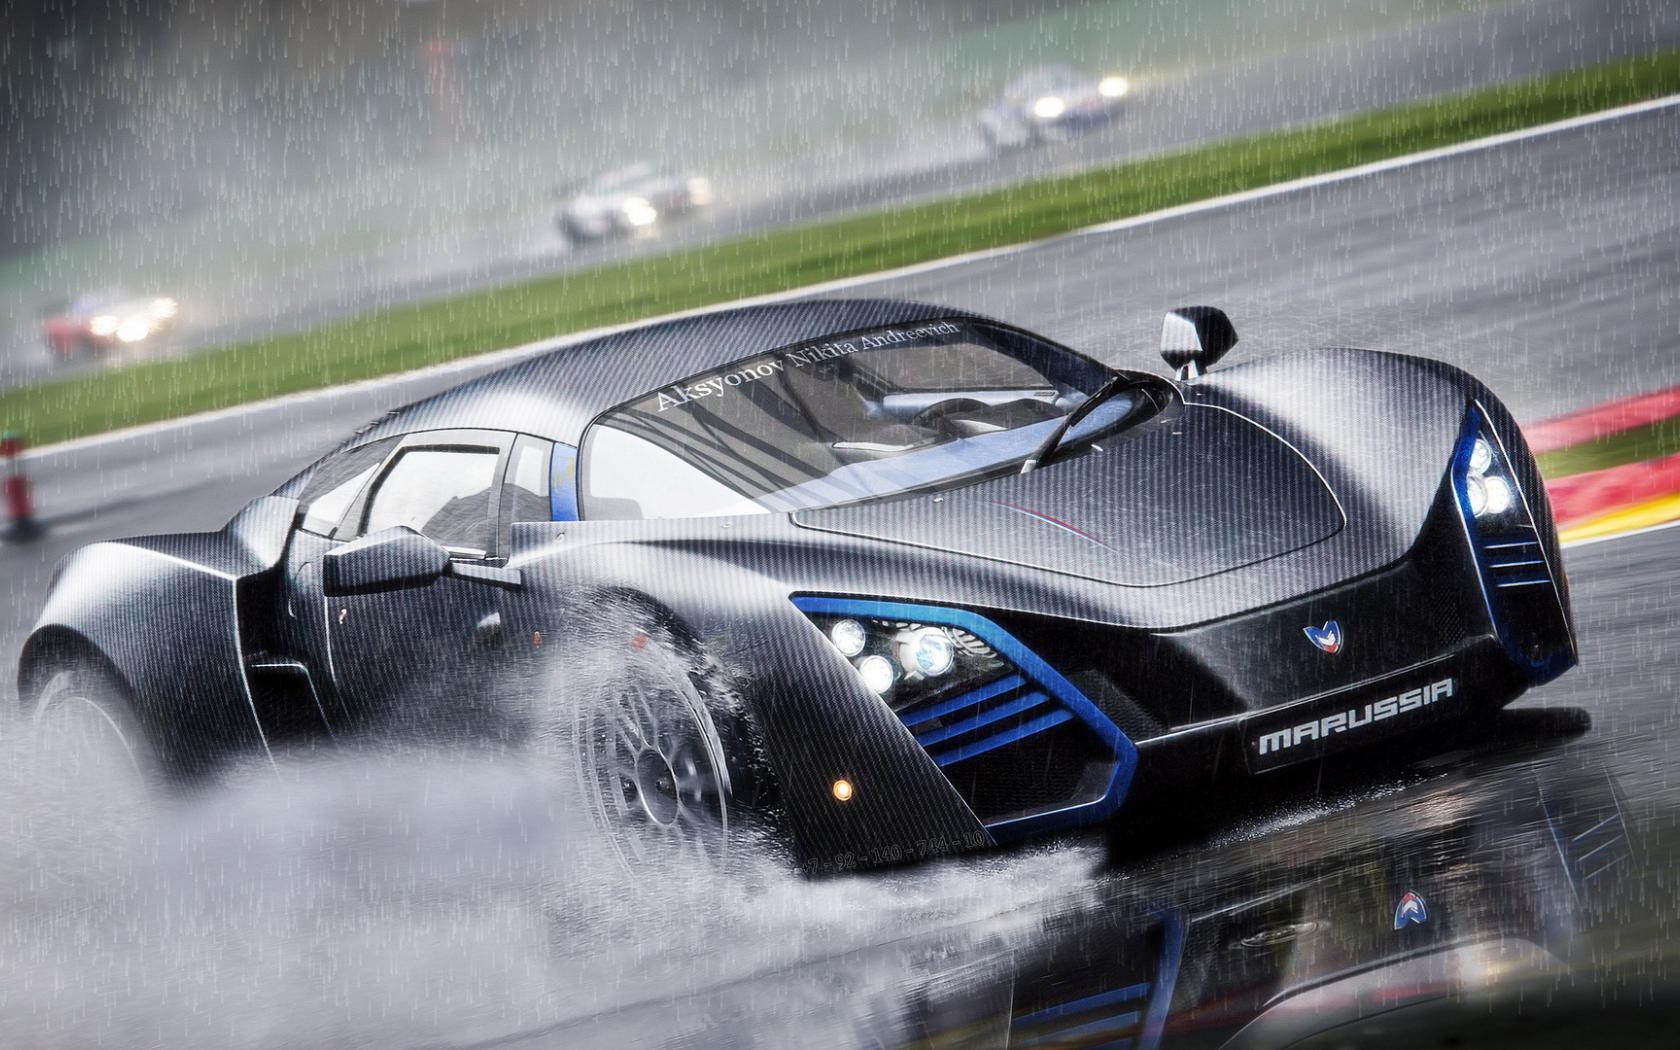 car on a wet - photo #3